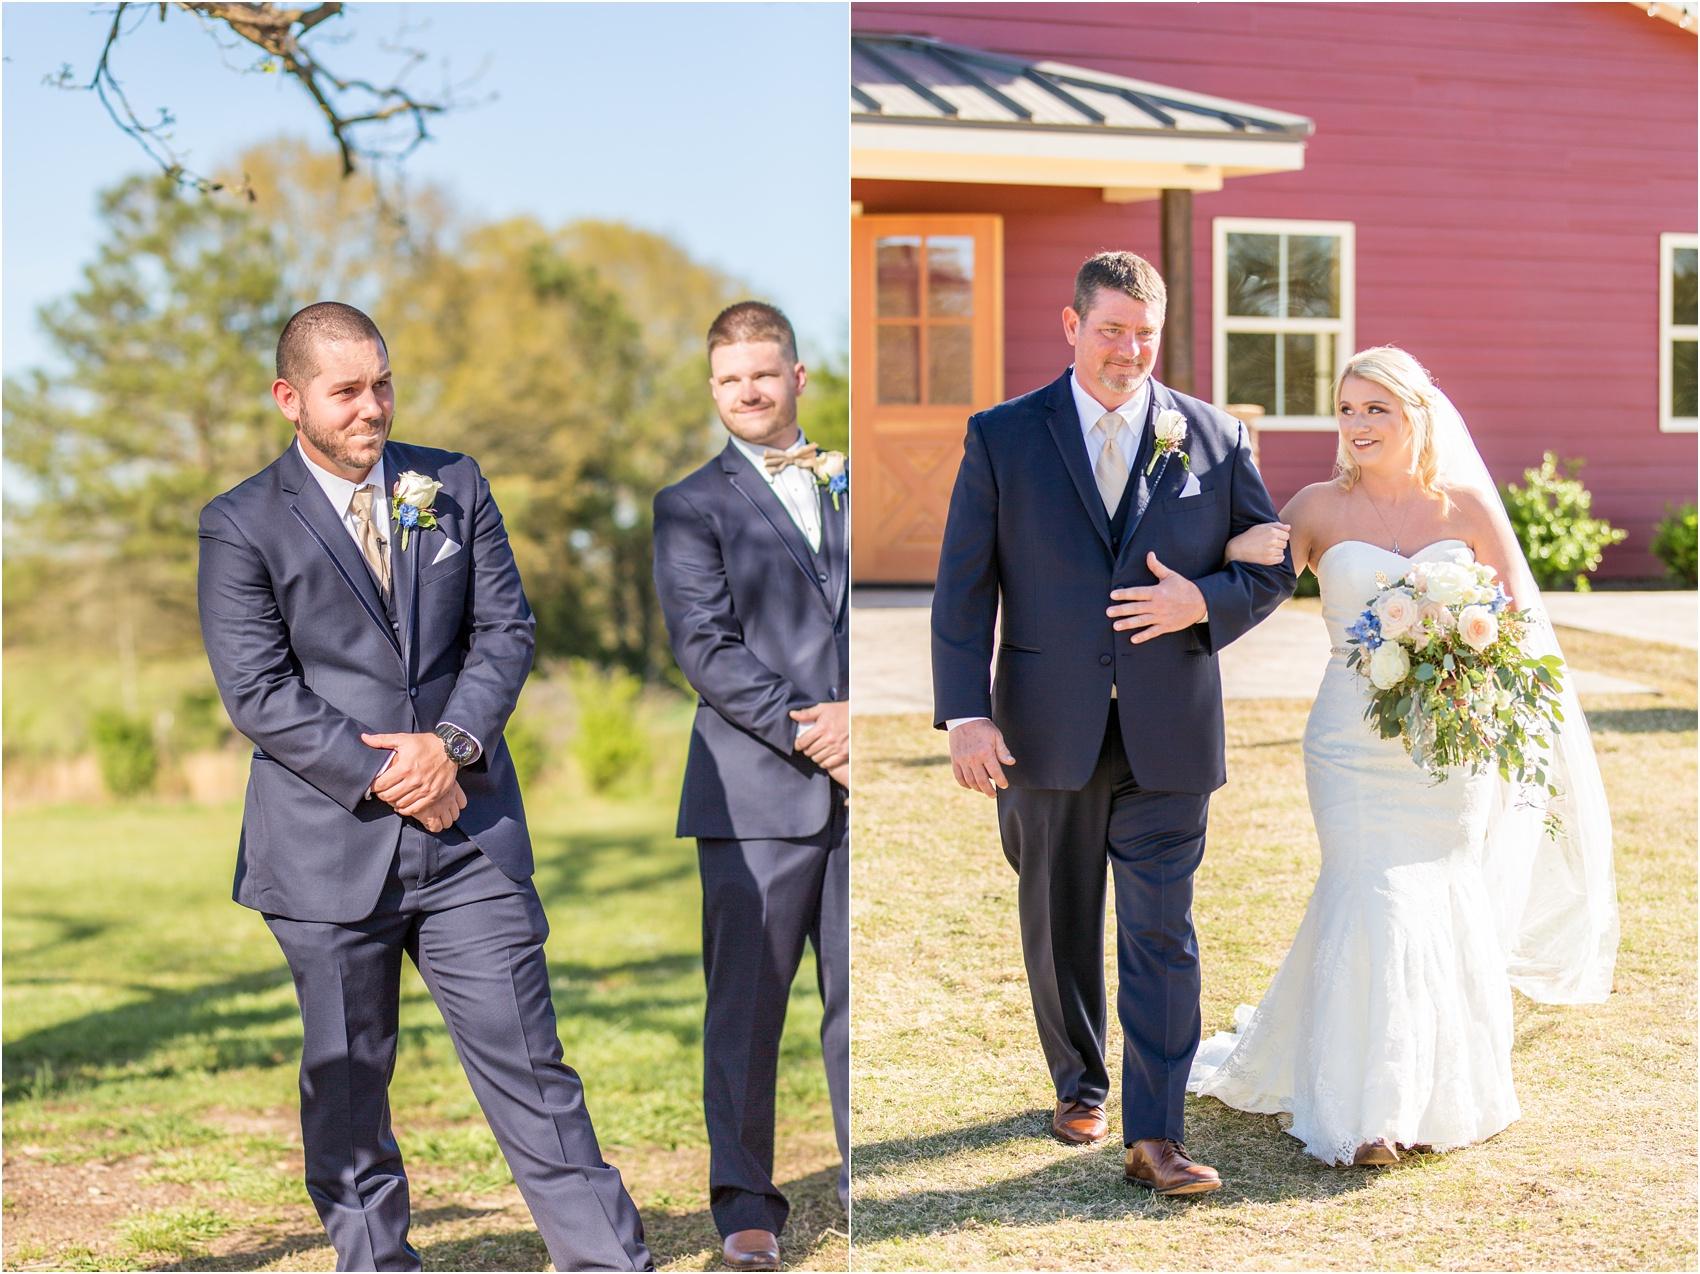 Savannah Eve Photography- Wade Wedding-45.jpg